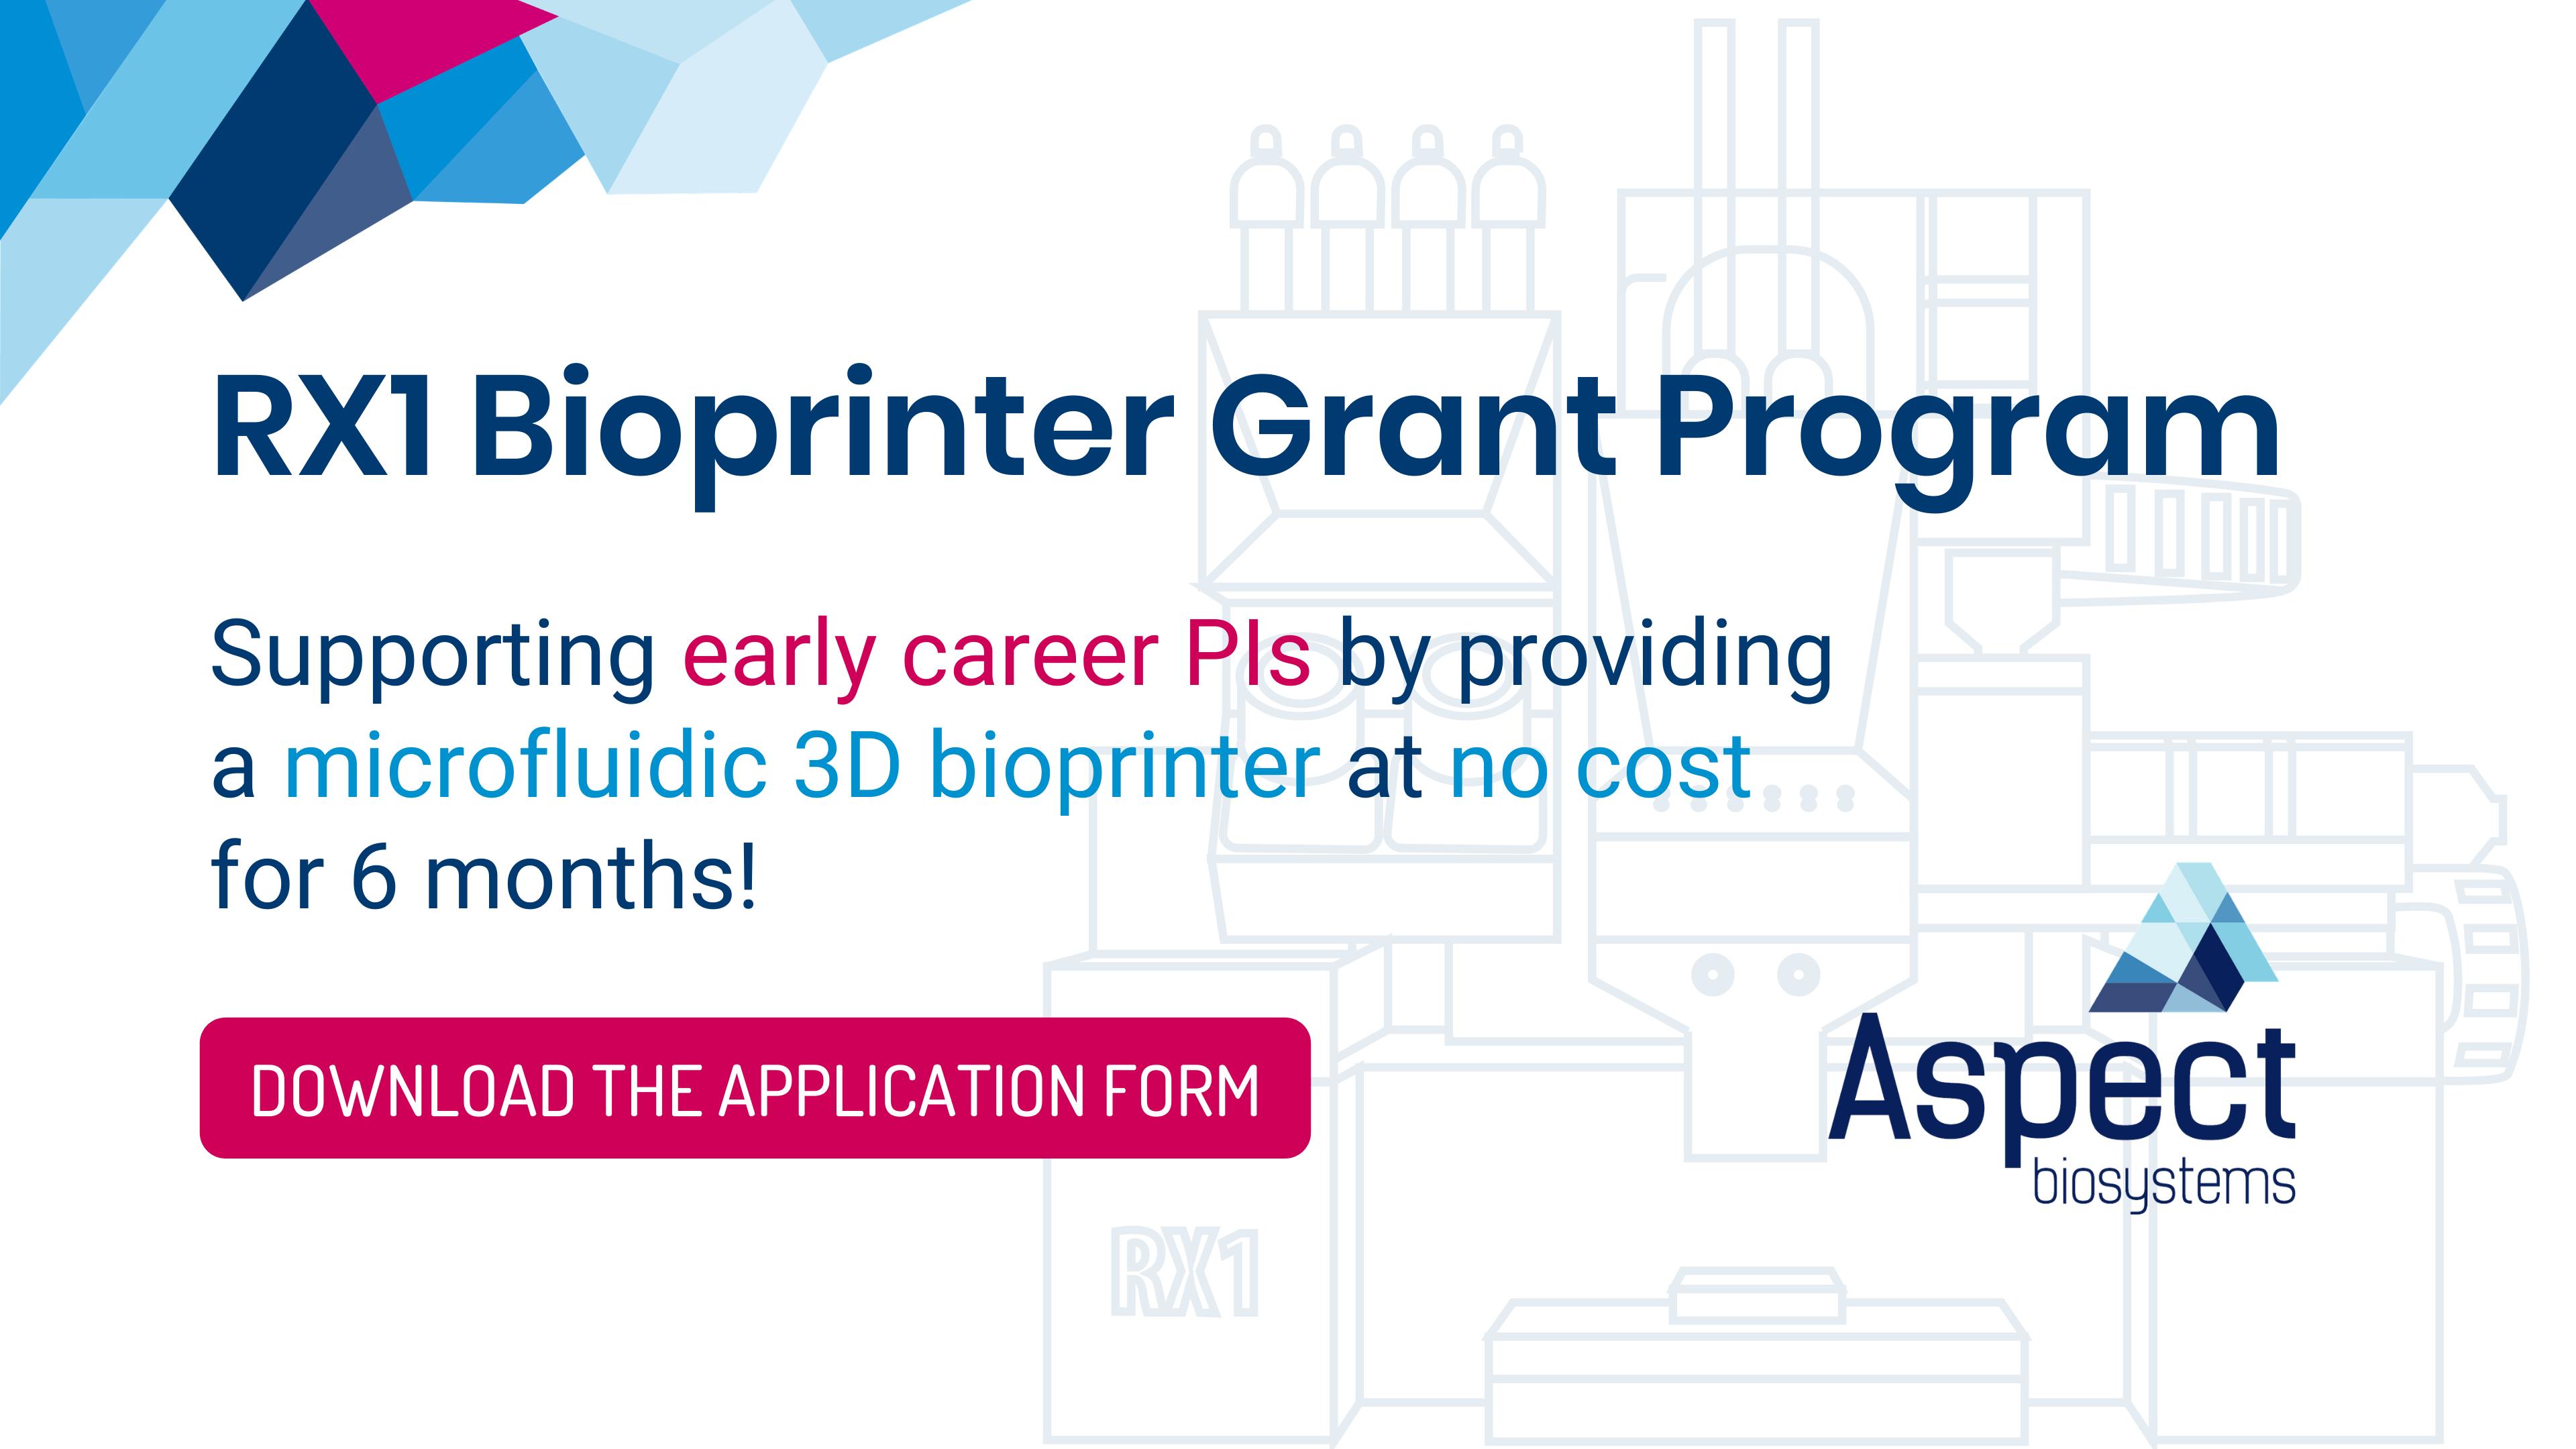 Banner for RX1 Bioprinter Grant Program for Early Career PIs